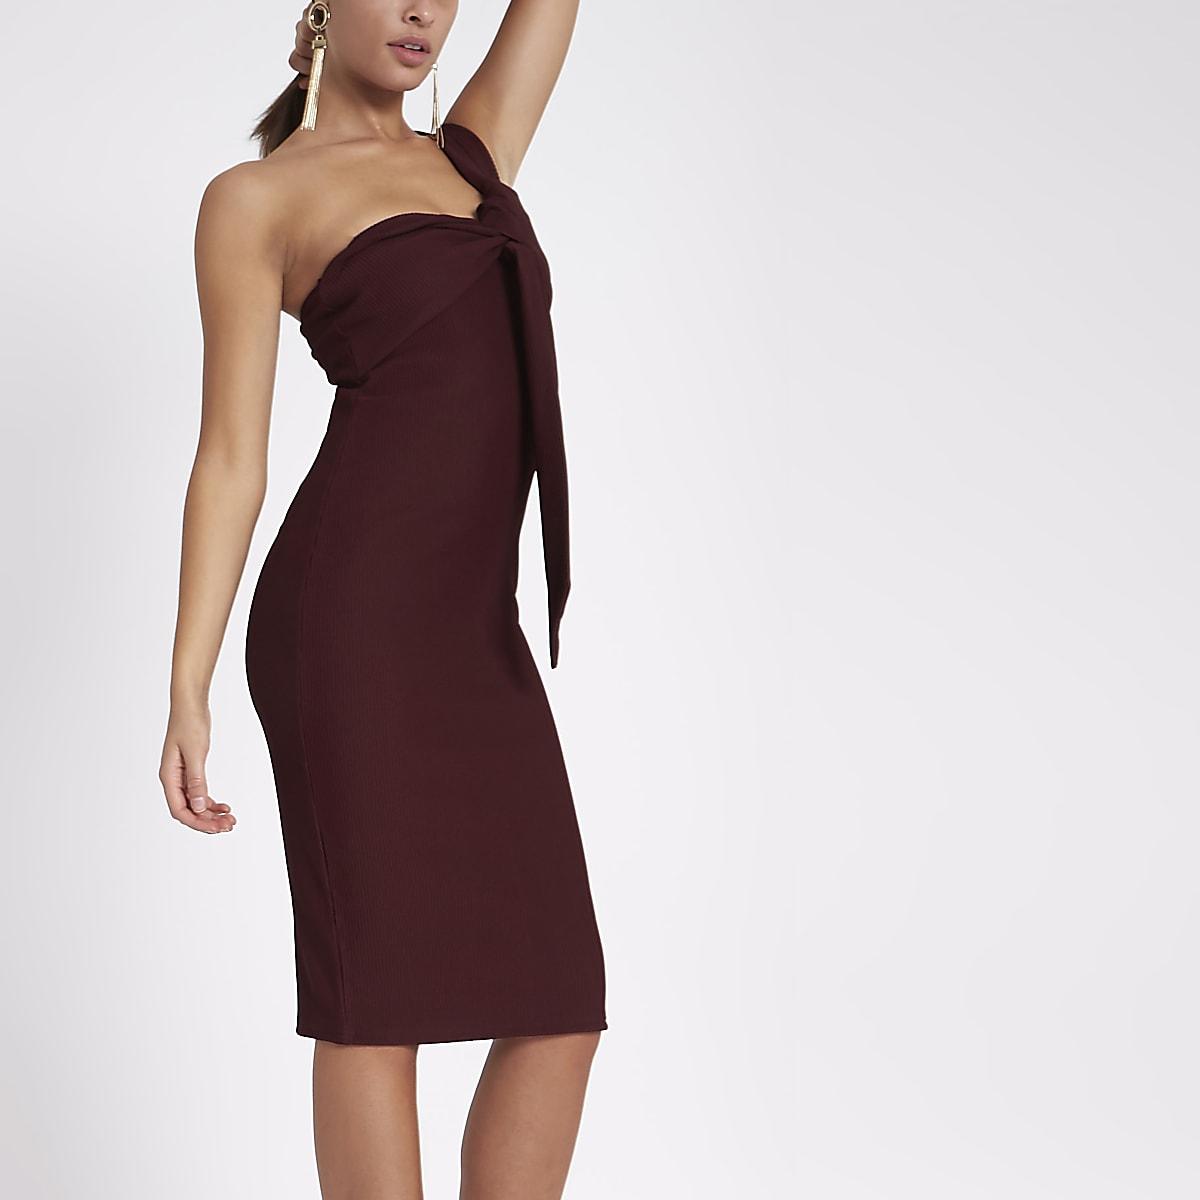 1c9512c66bb Dark red rib one shoulder twist midi dress - Bodycon Dresses - Dresses -  women